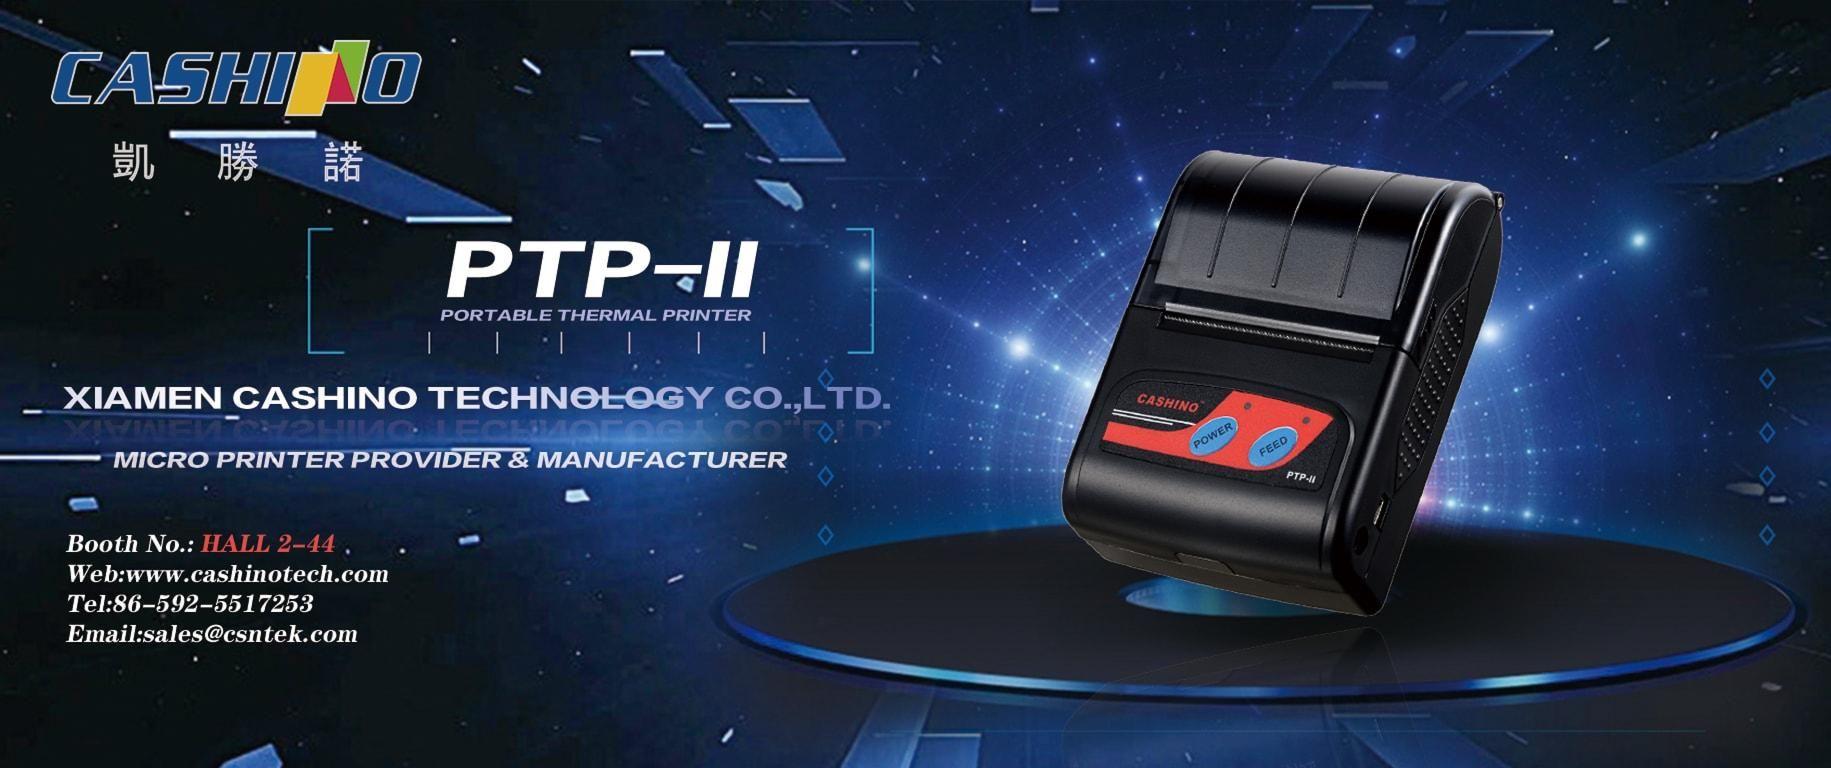 Xiamen Cashino Technology Co., Ltd.